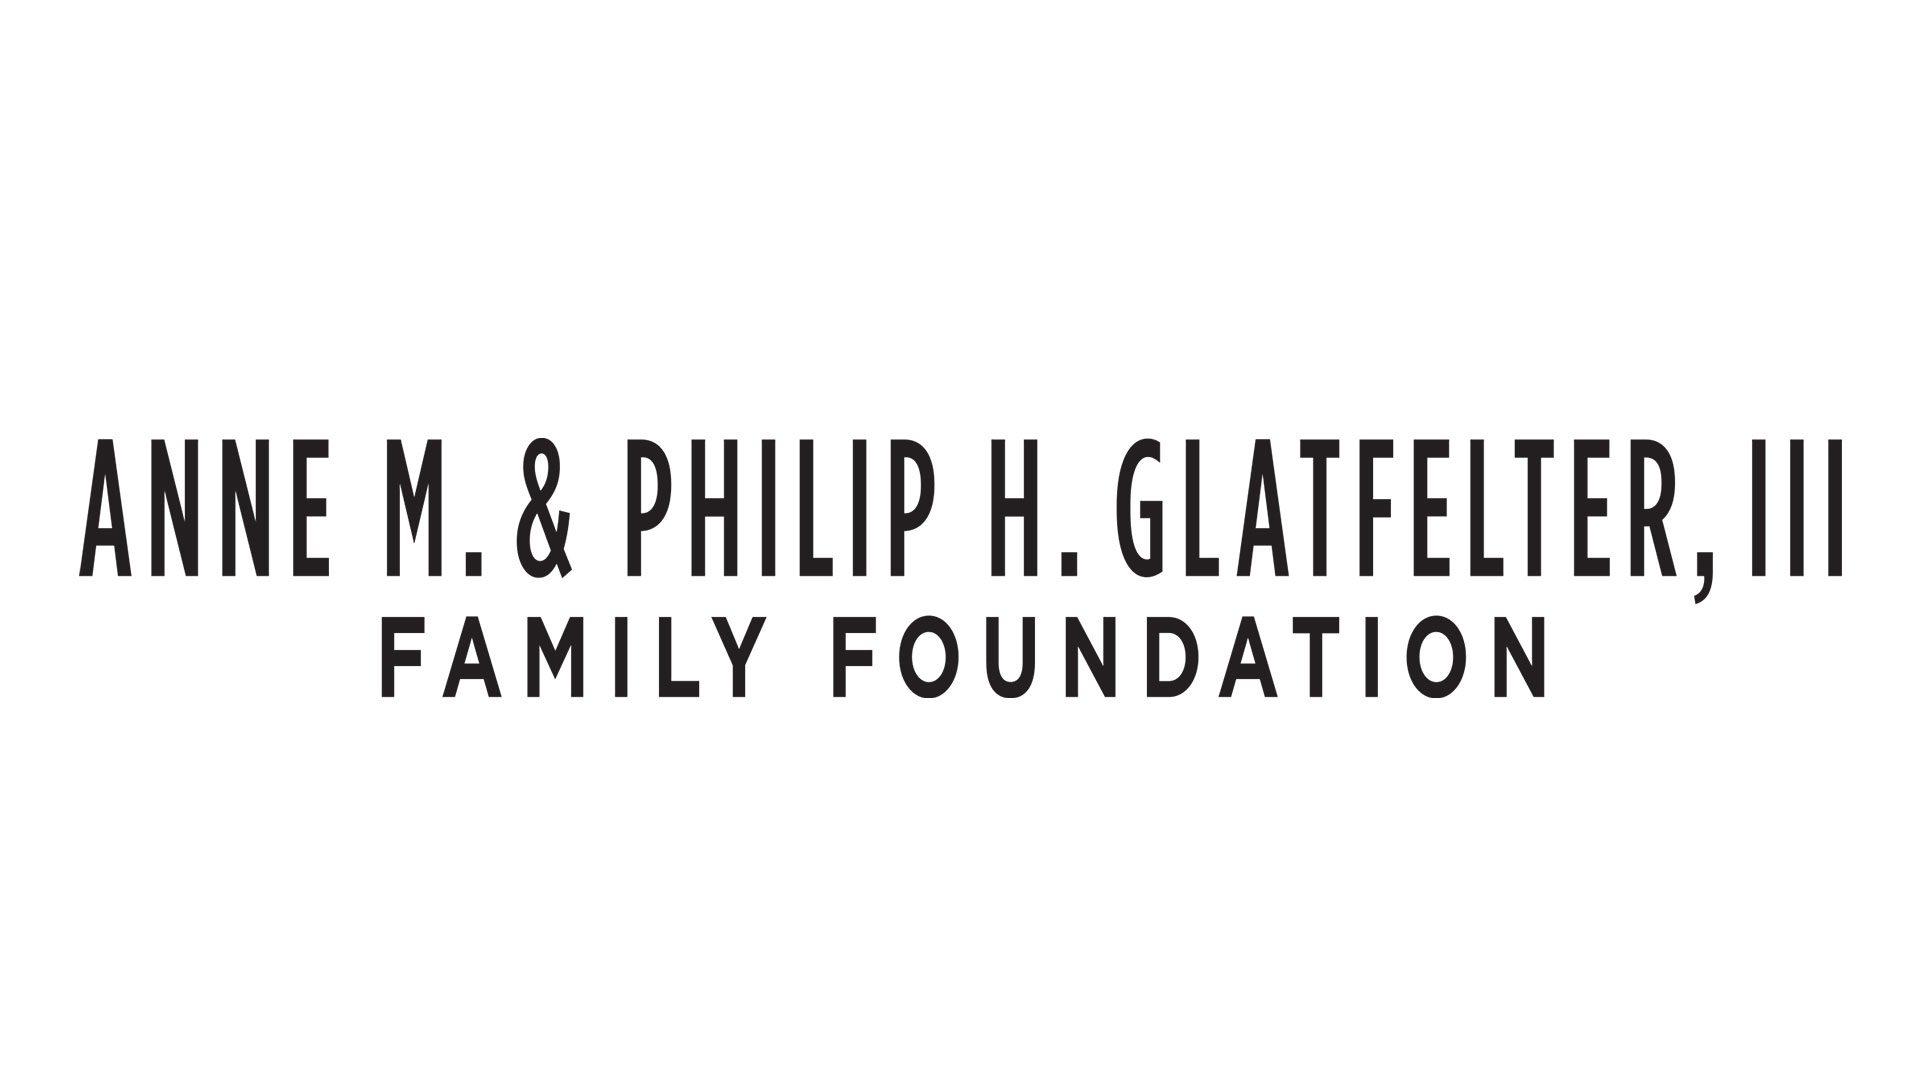 Anne & Philip Glatfelter Family Foundation